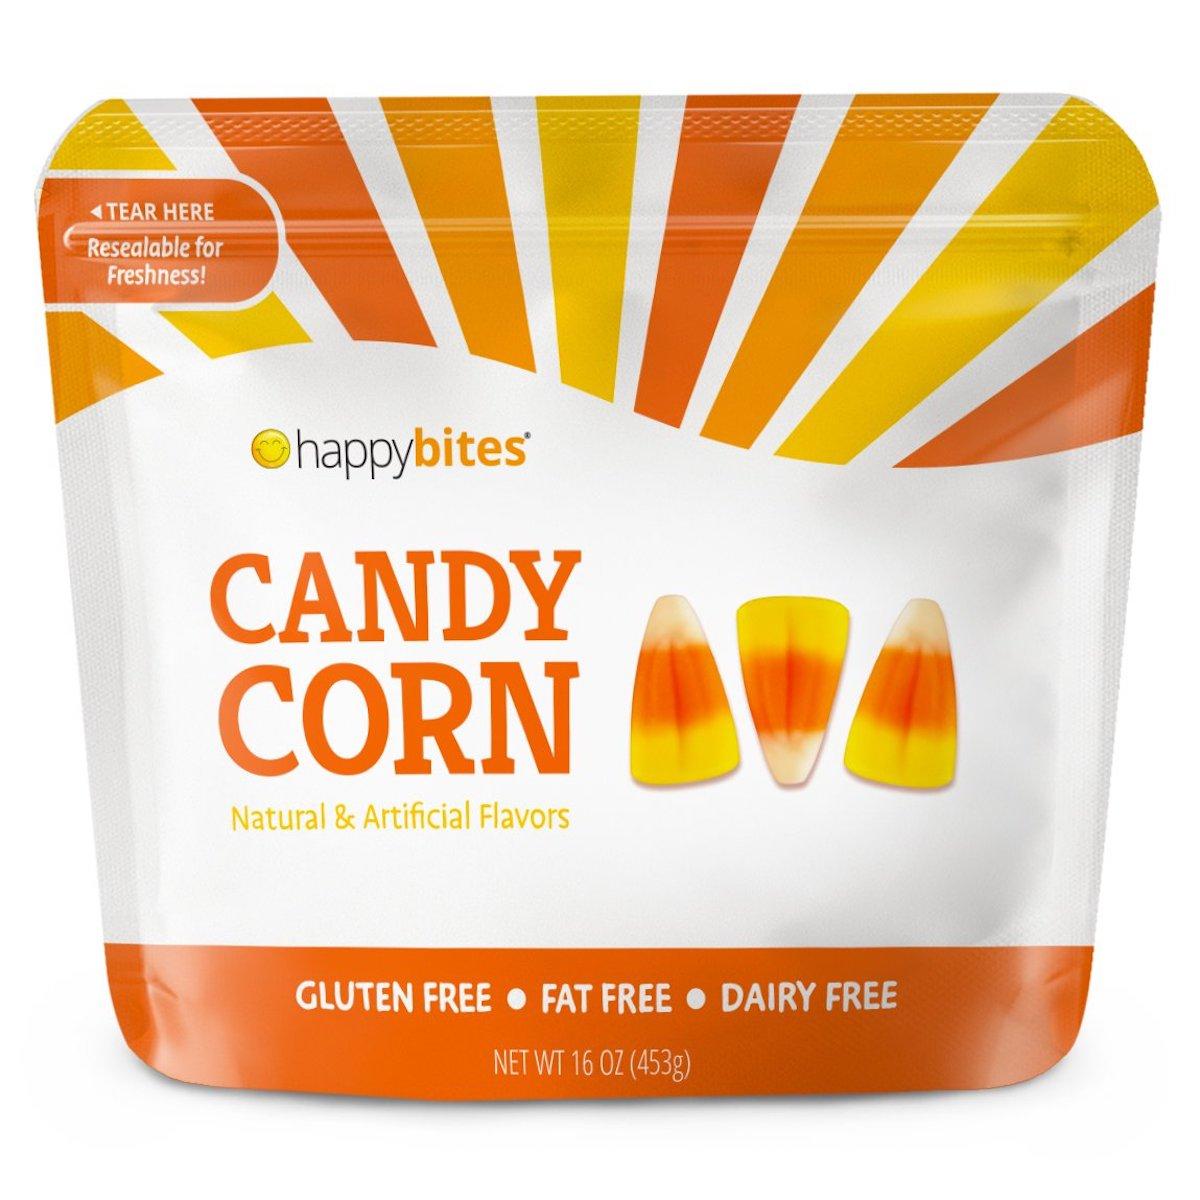 Bag of happy bites candy corn.